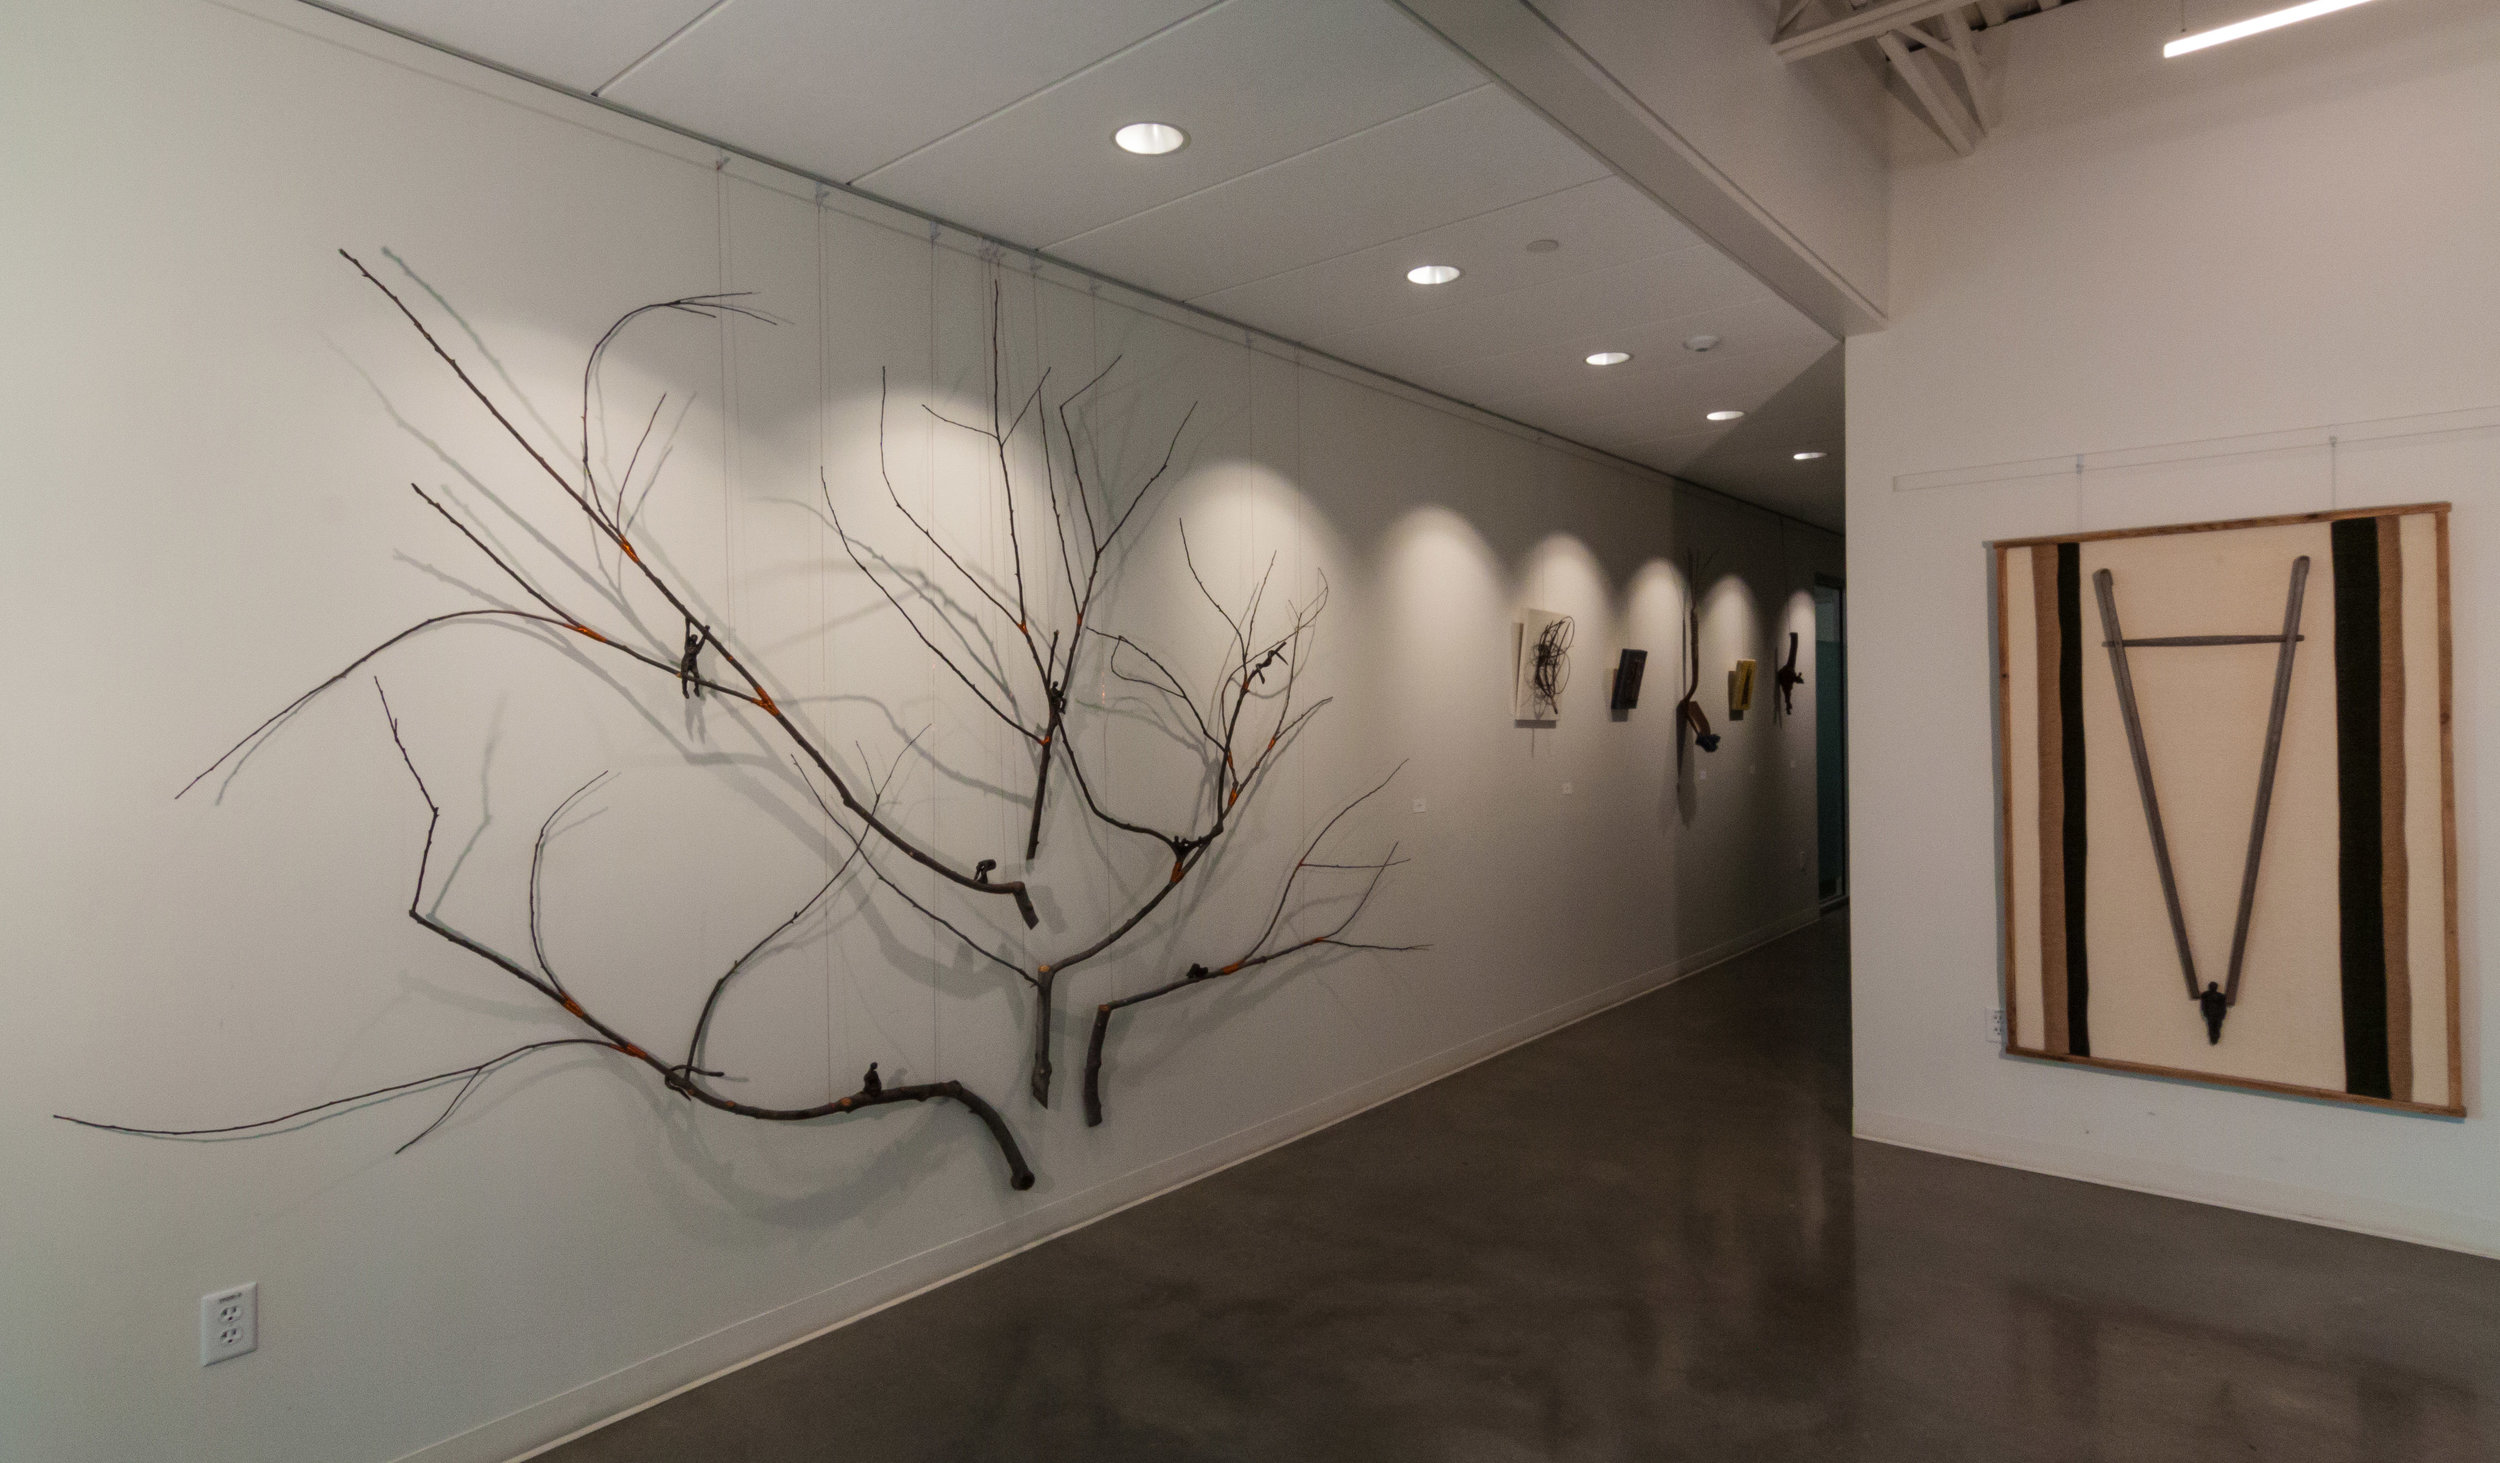 Grafting a Life (Left Wall) Linda Hoffman & Ariel Matisse